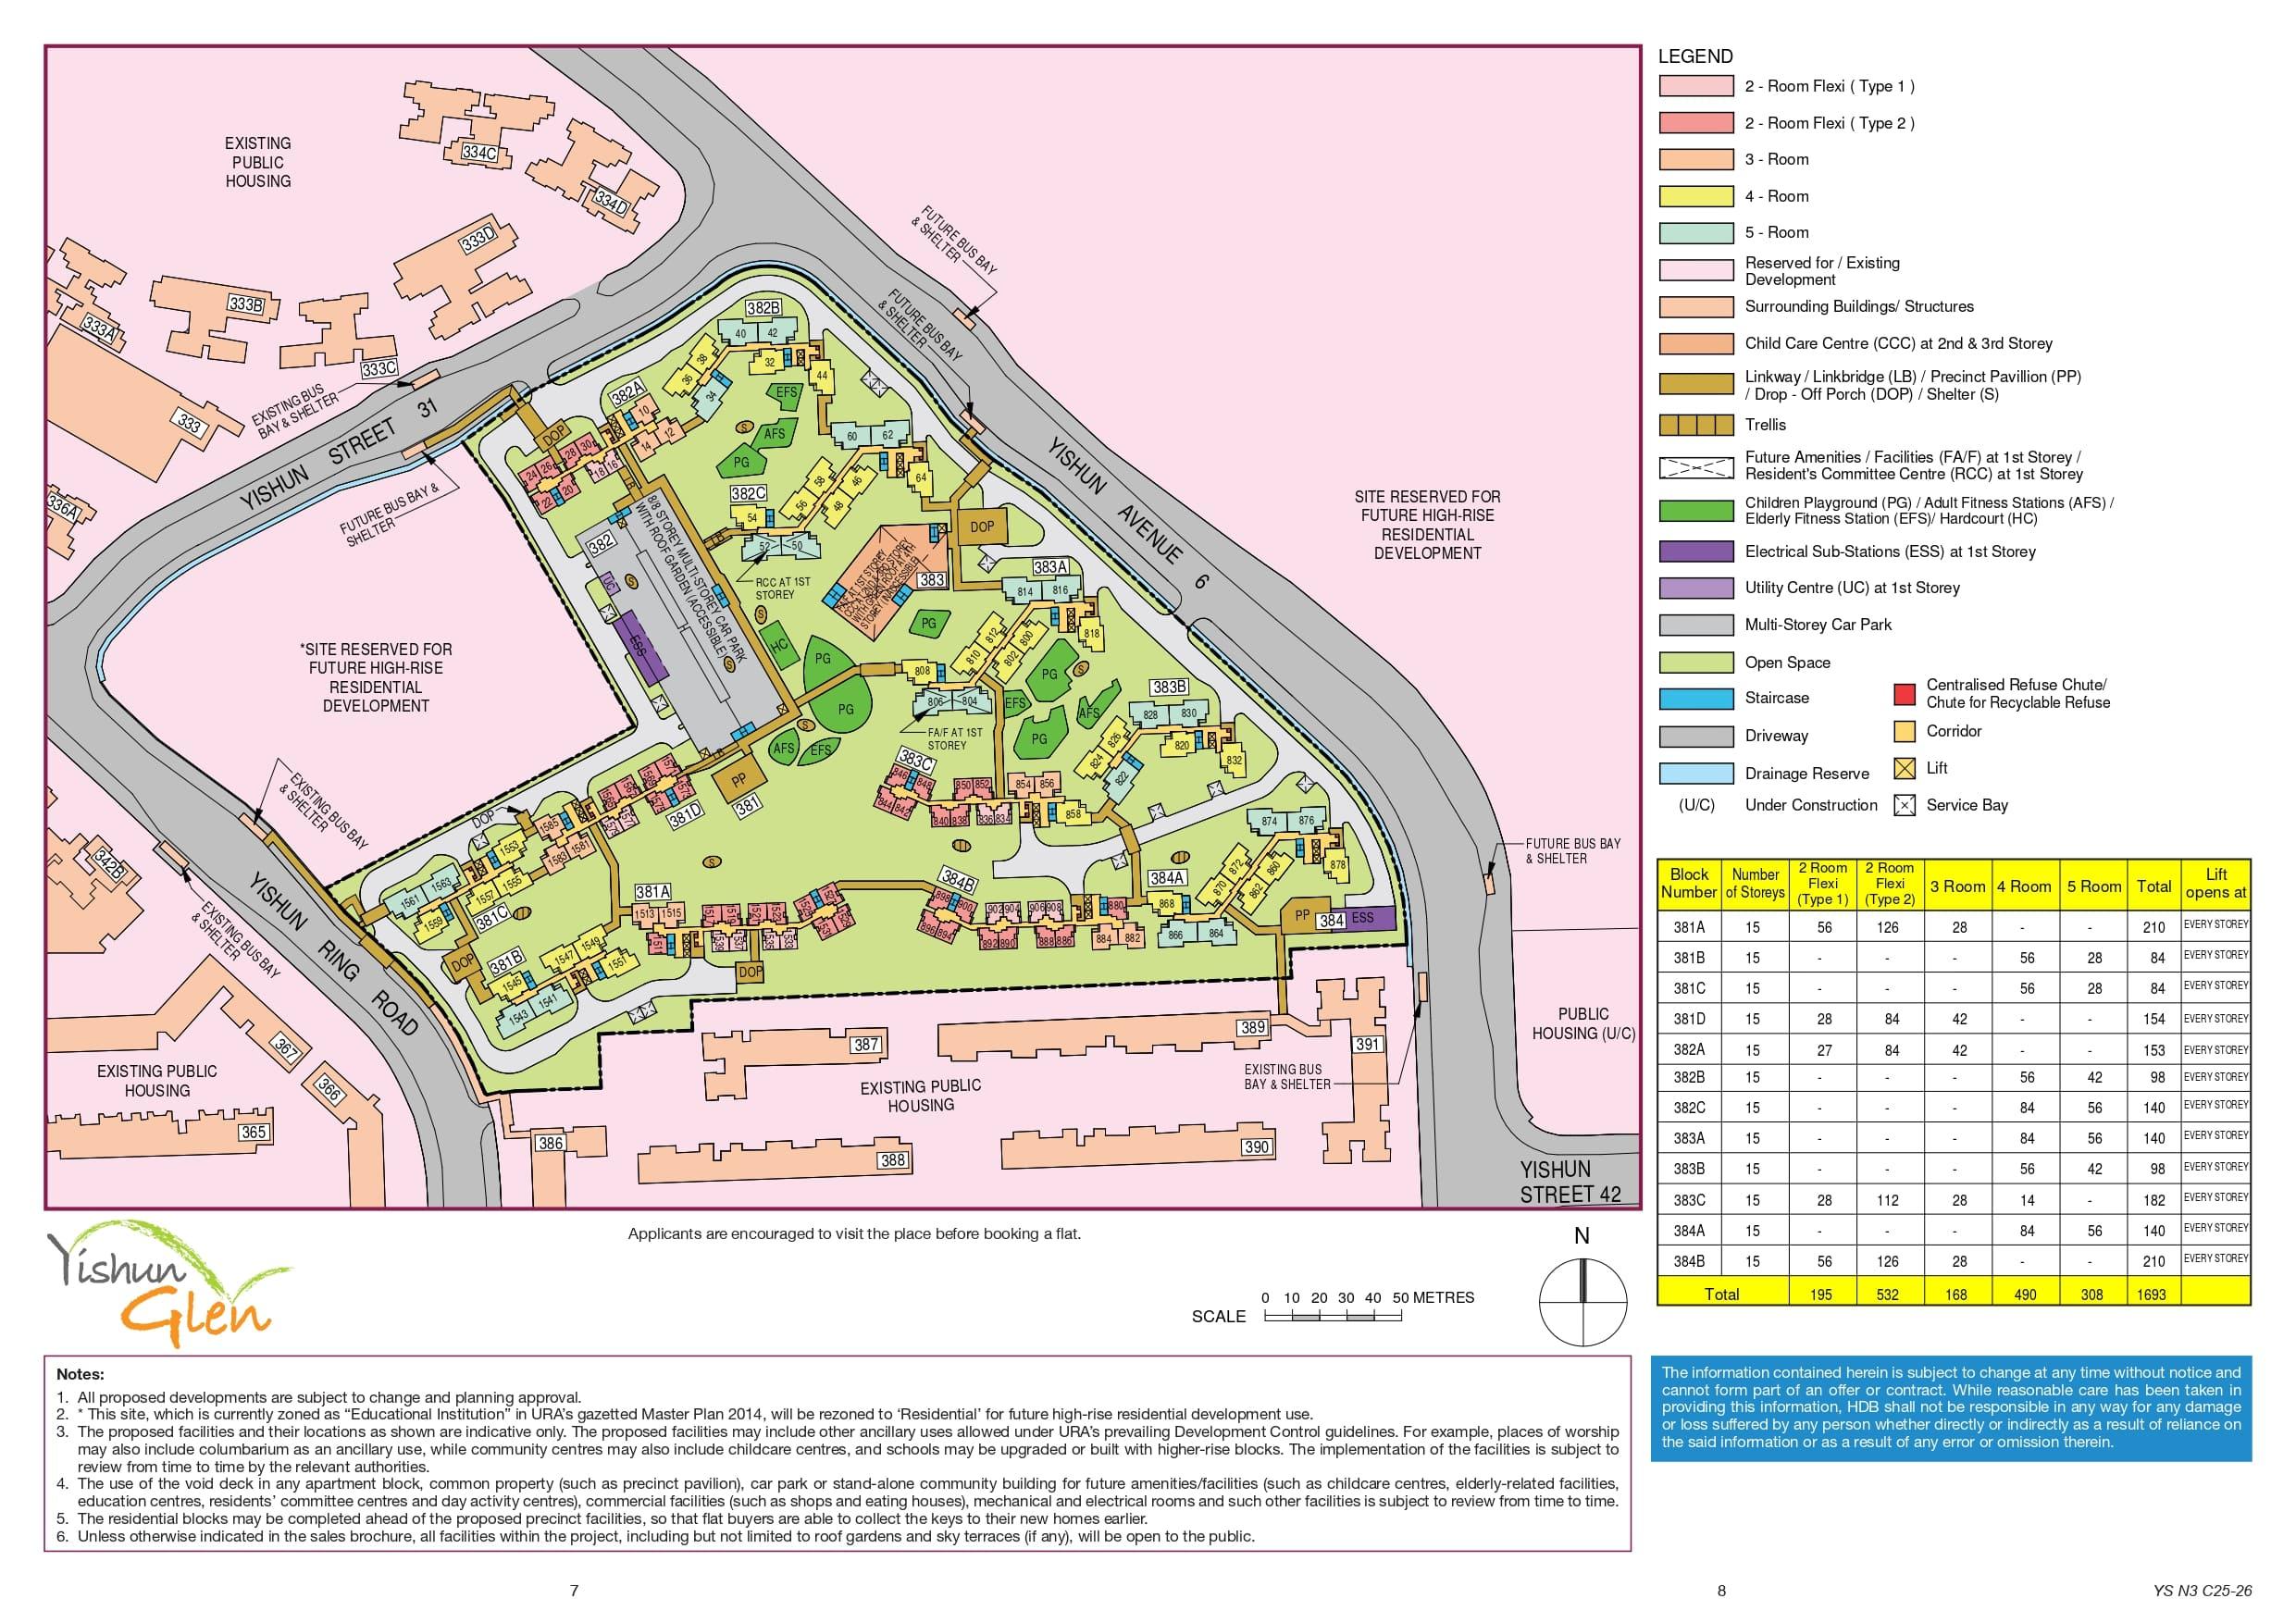 Yishun Glen Site Plan